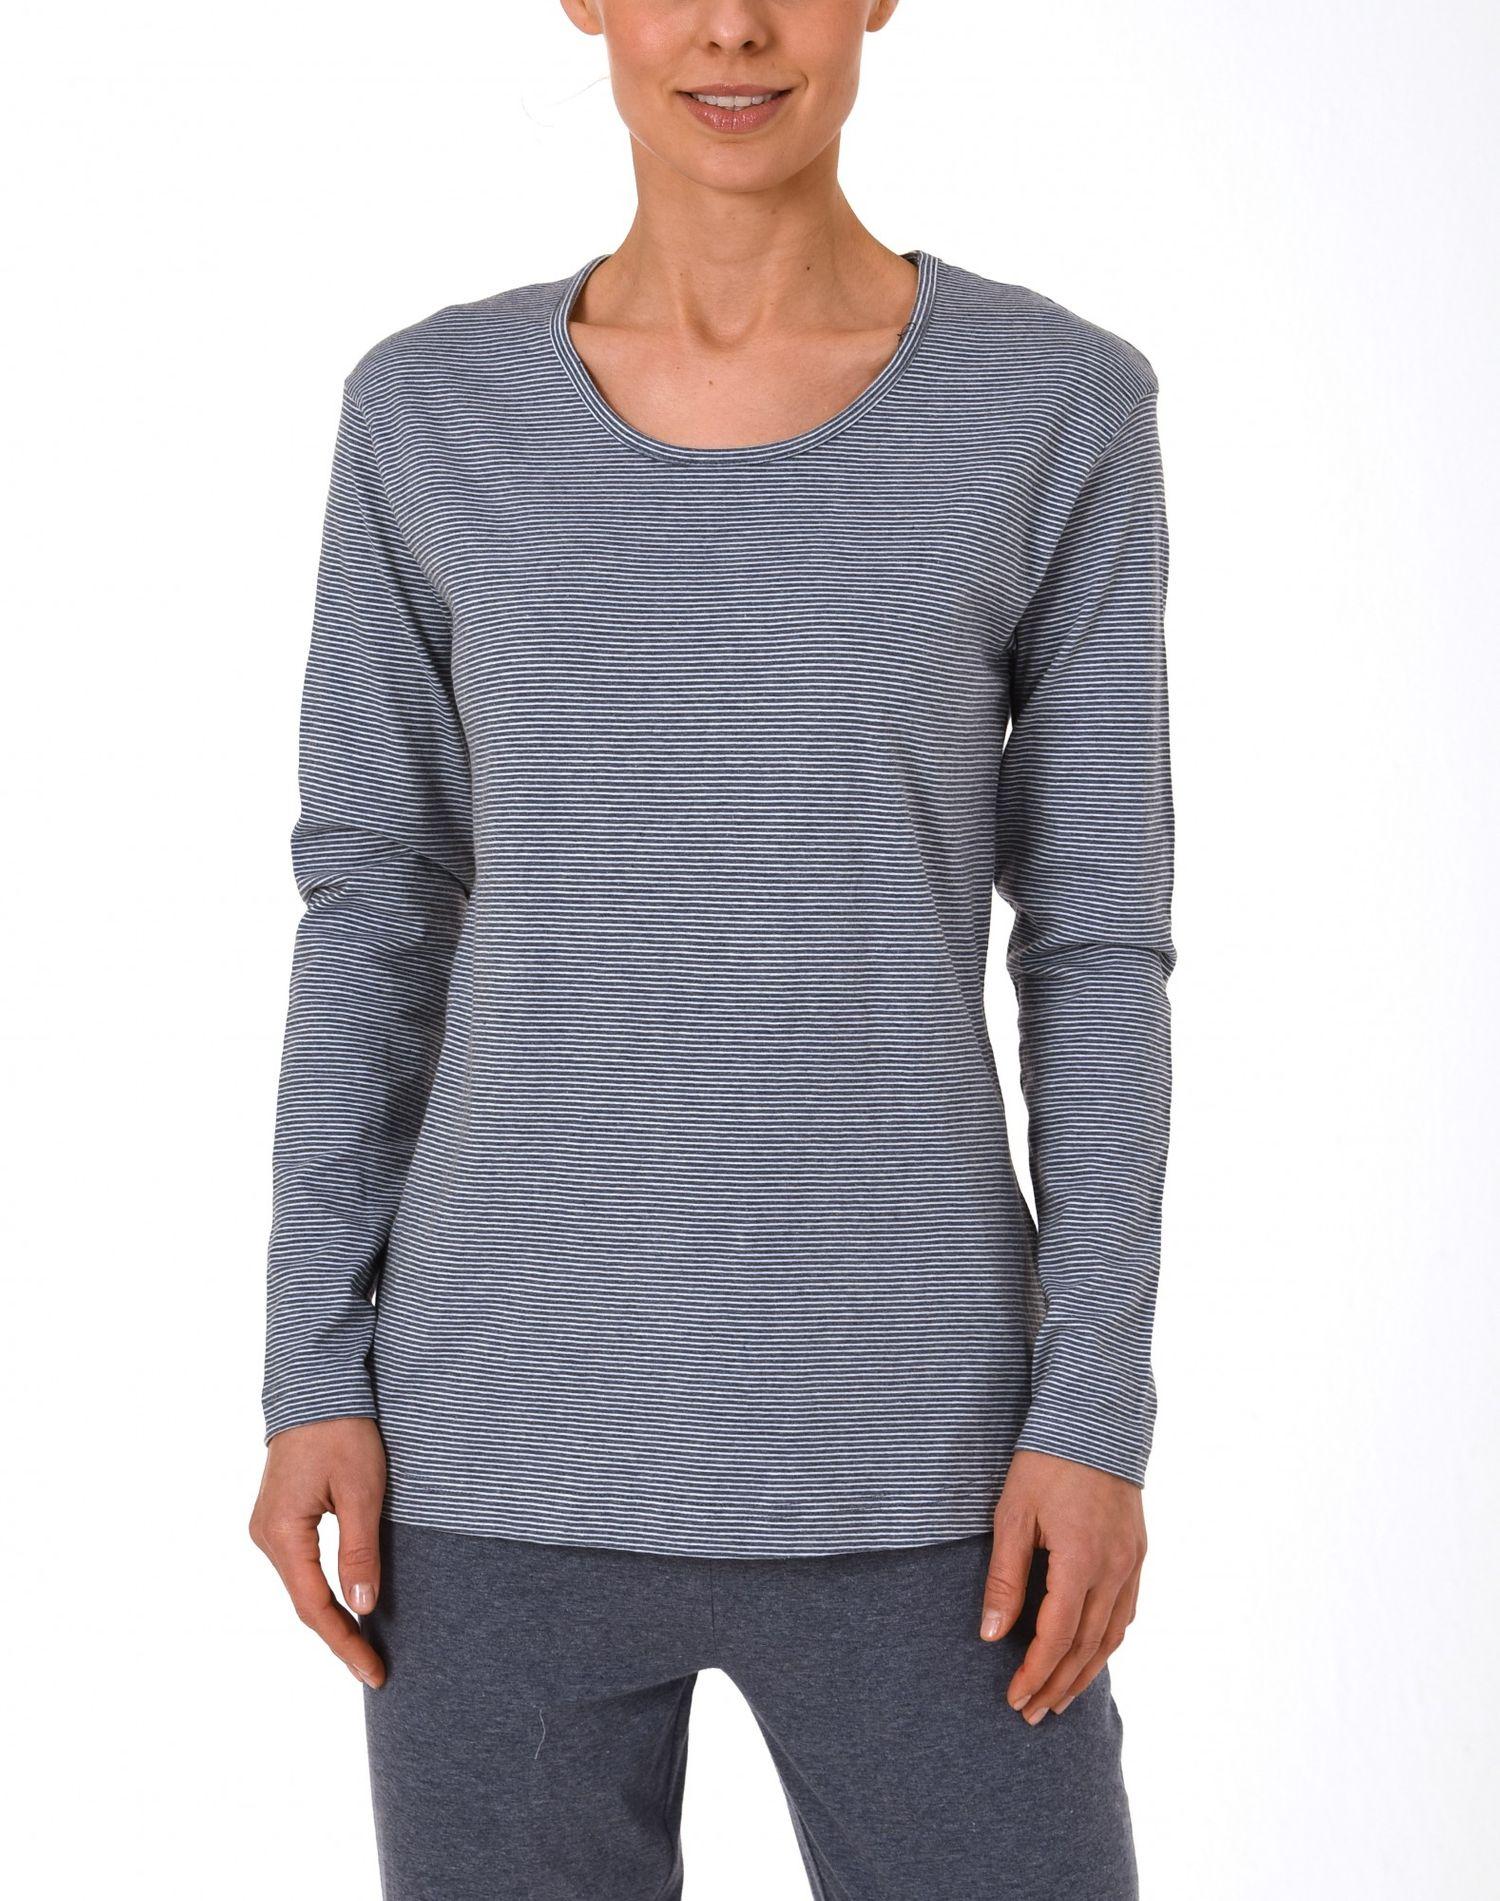 Damen Shirt  Oberteil - langarm Mix & Match Streifendesign – 171 219 90 903 – Bild 1